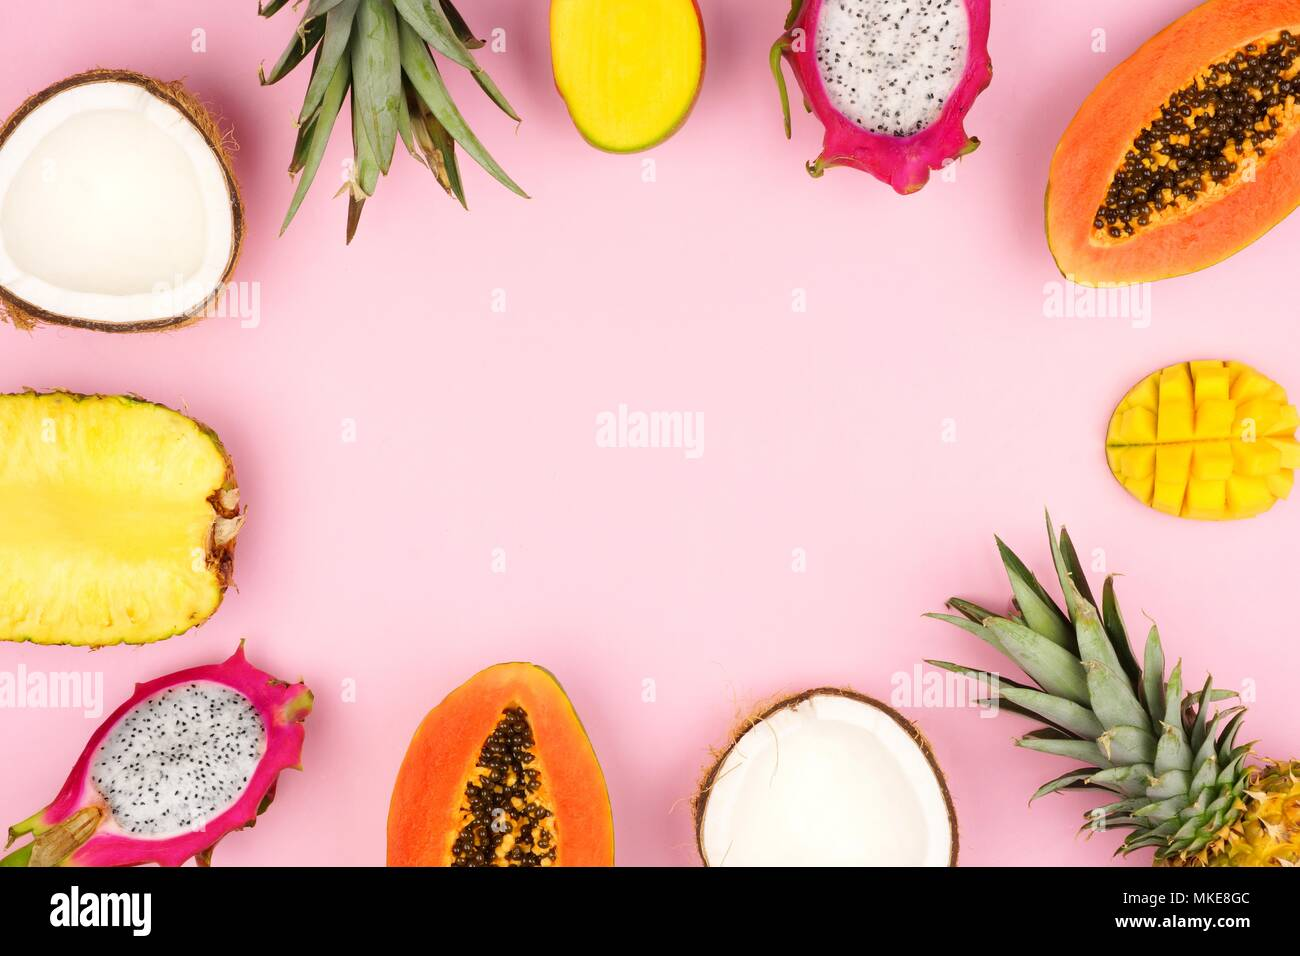 Tropical fruit frame with pineapple, dragon fruit, papaya, coconut ...